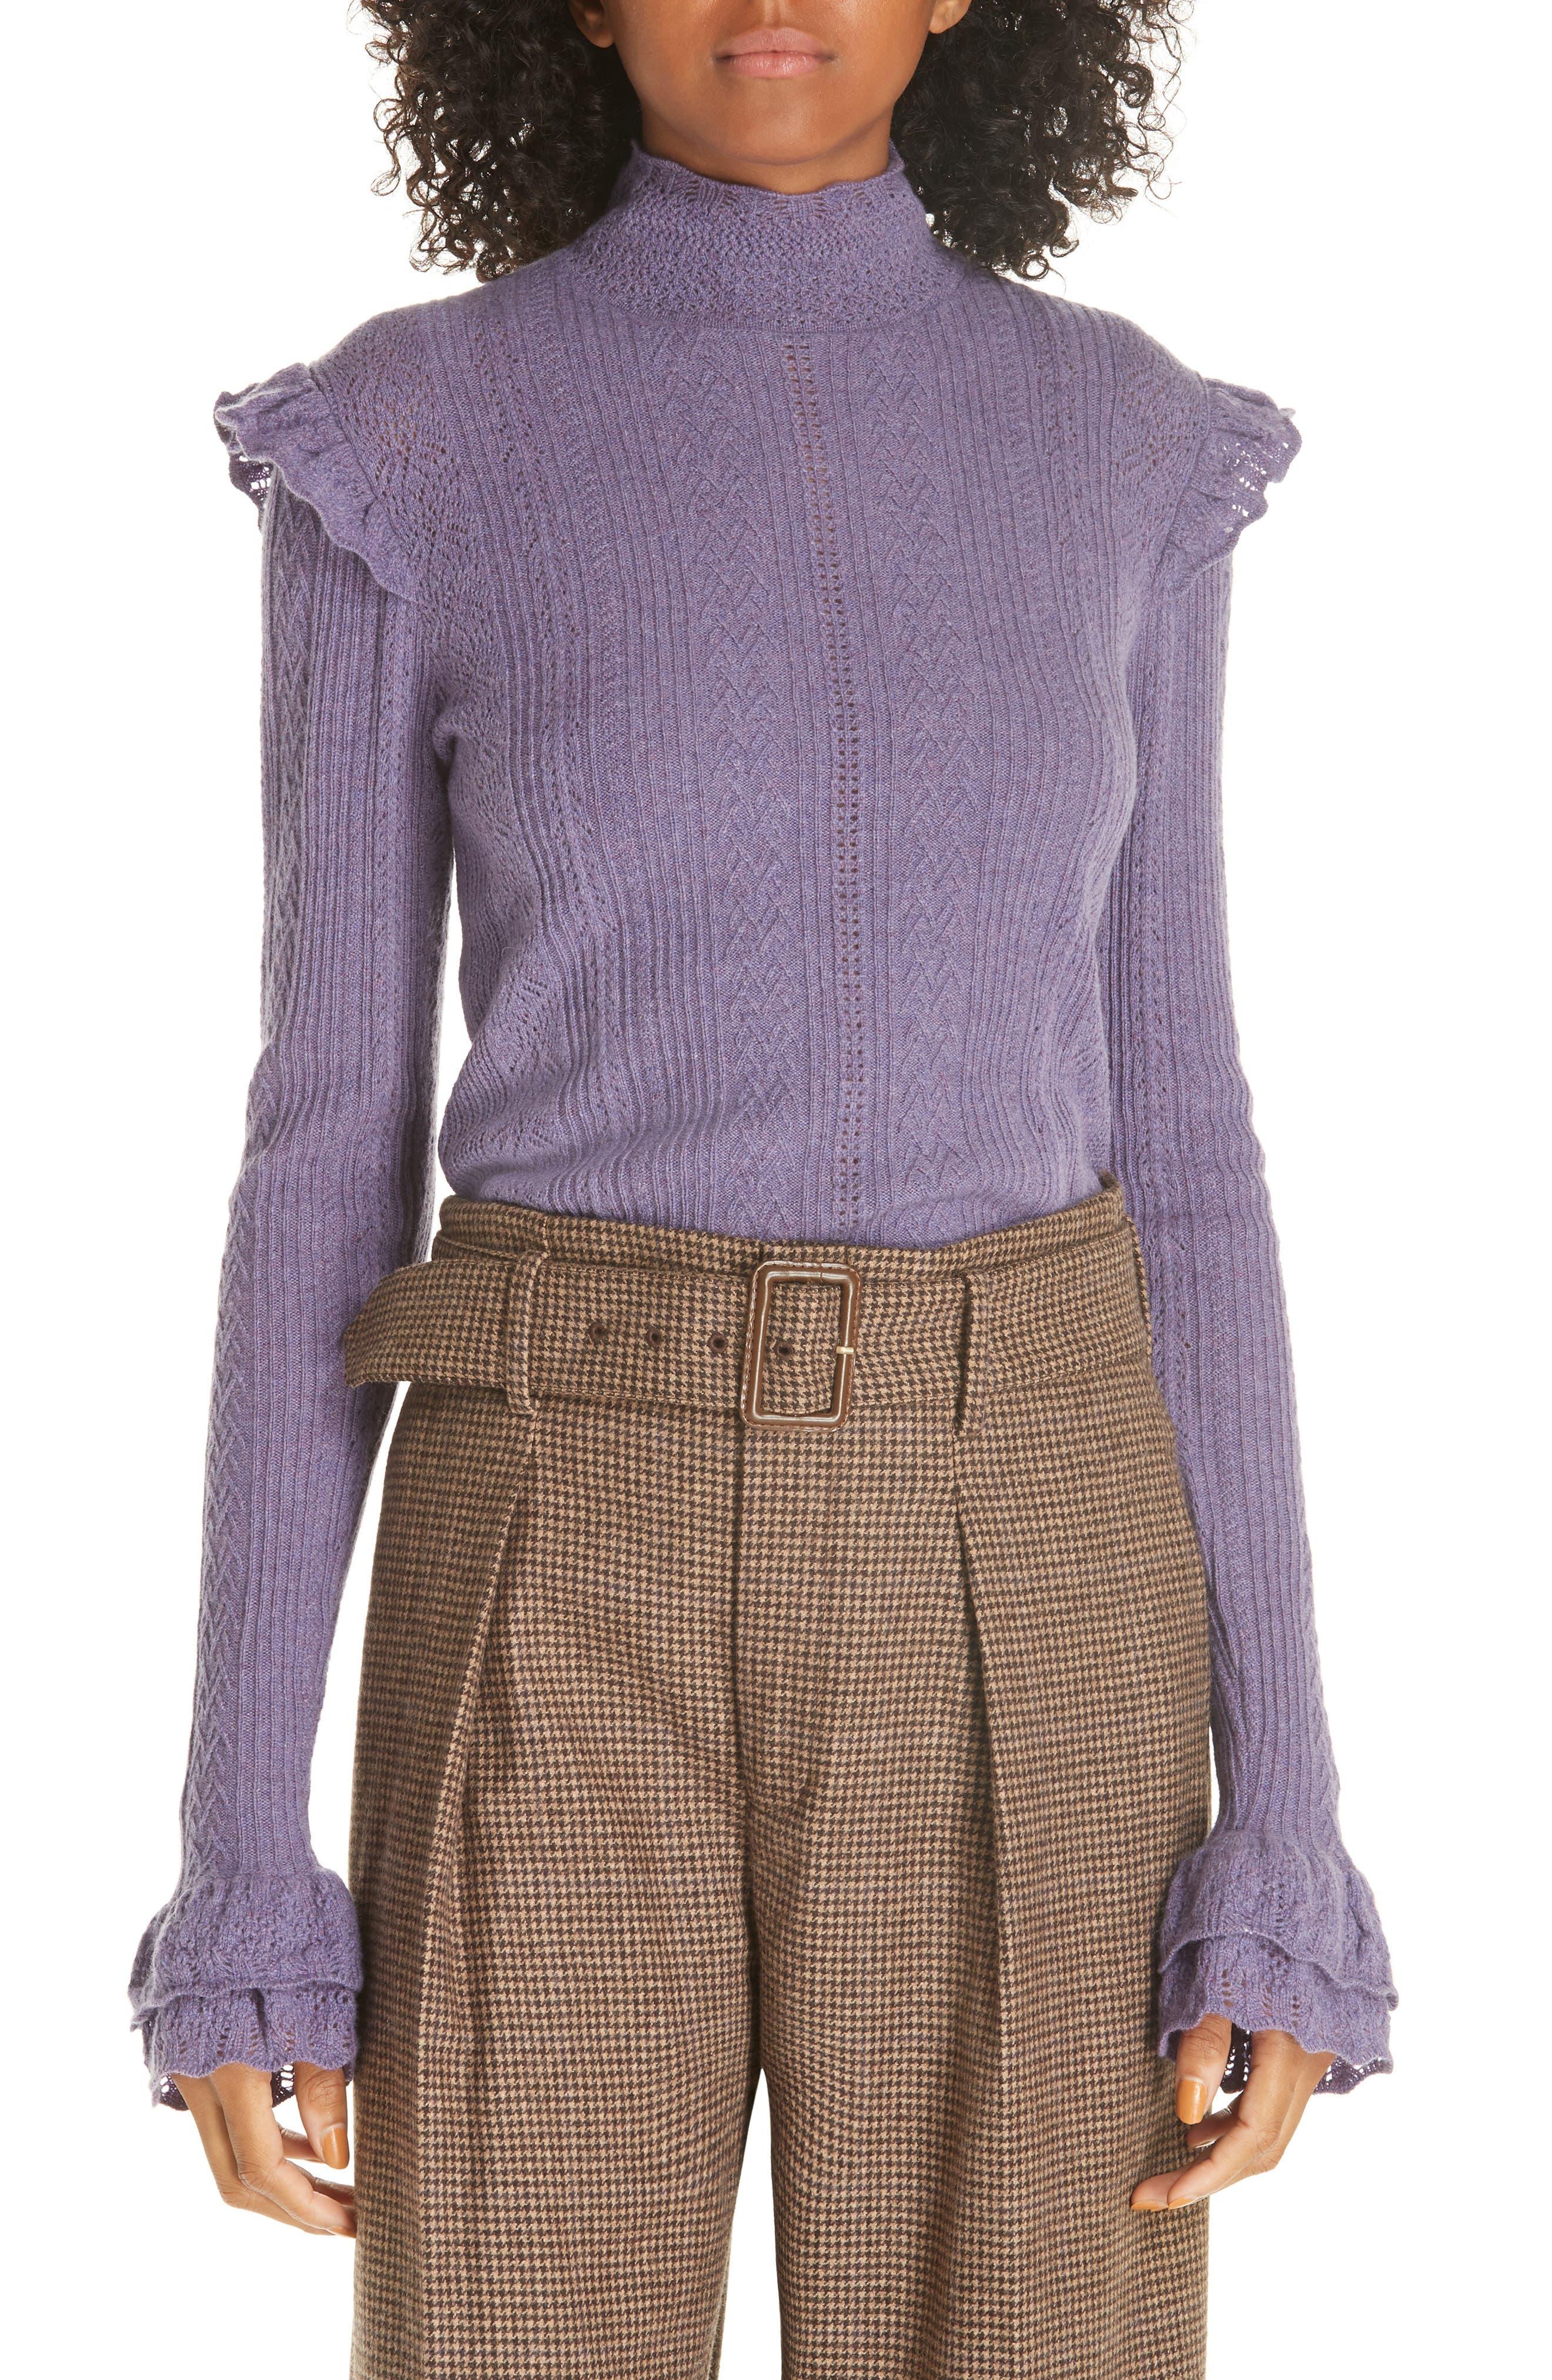 POLO RALPH LAUREN,                             Ruffle Detail Pointelle Sweater,                             Main thumbnail 1, color,                             500